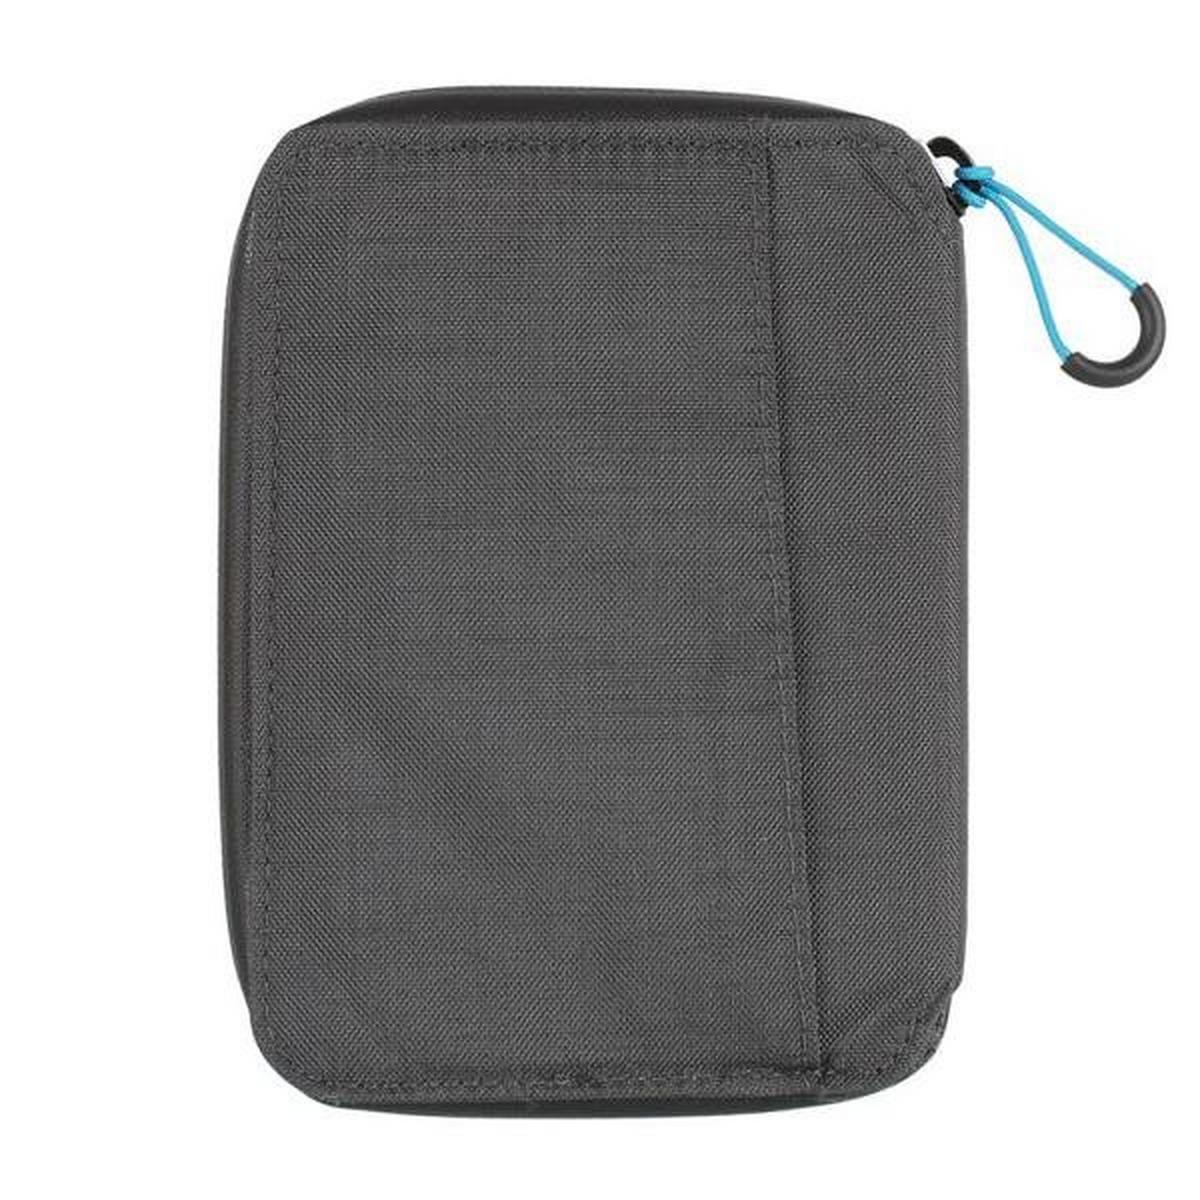 Lifeventure RFiD Travel Wallet - Mini Grey